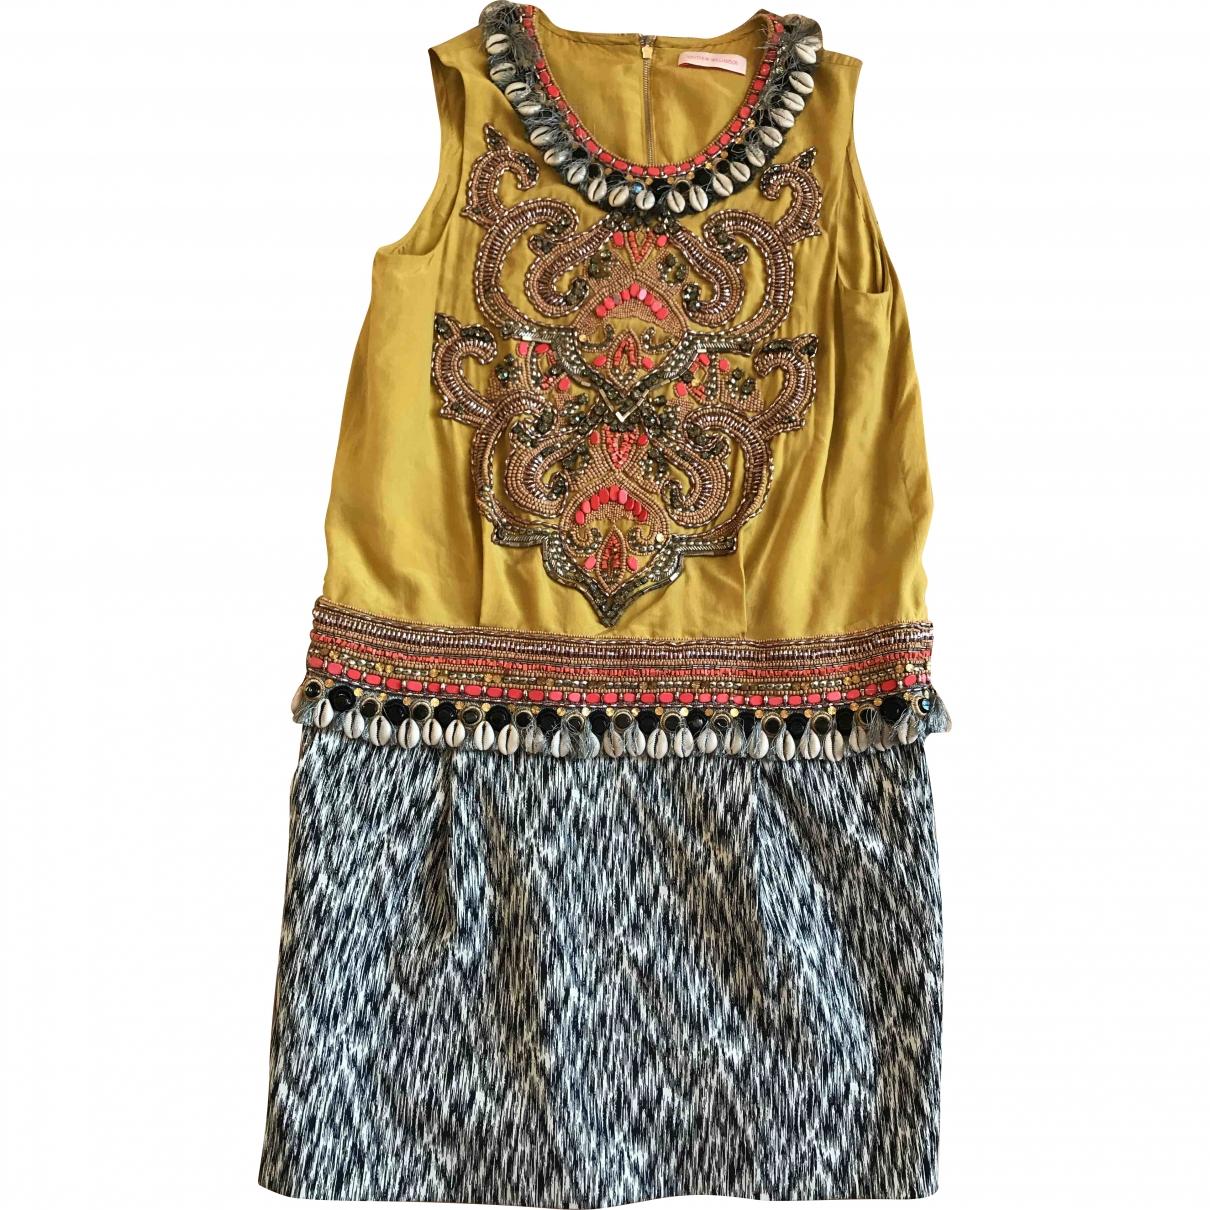 Matthew Williamson - Robe   pour femme en coton - elasthane - multicolore